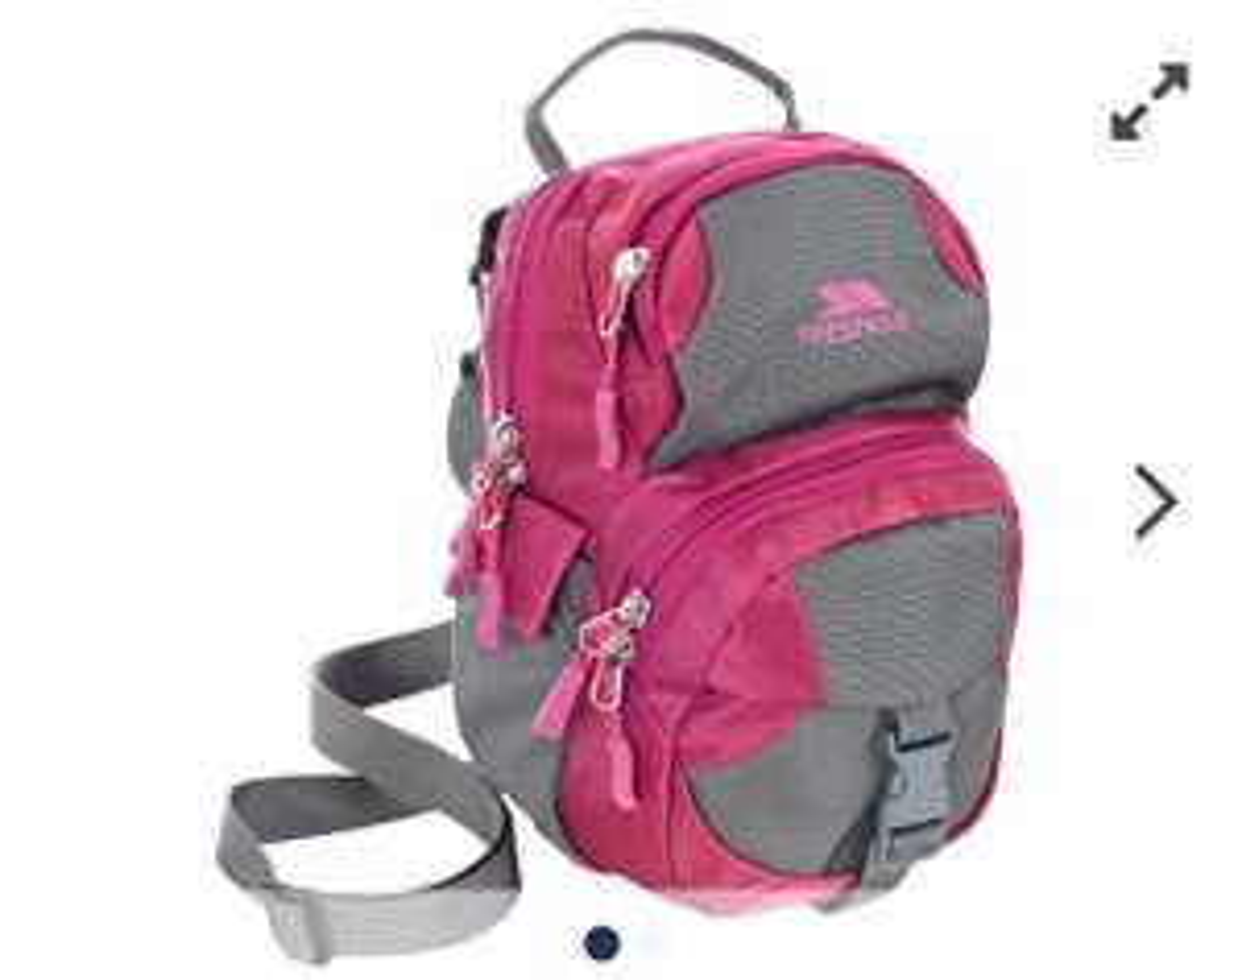 Clio 1.5 Litre Pink Shoulder Bag - £4.99 (+£2.95 Delivery) @ Trespass